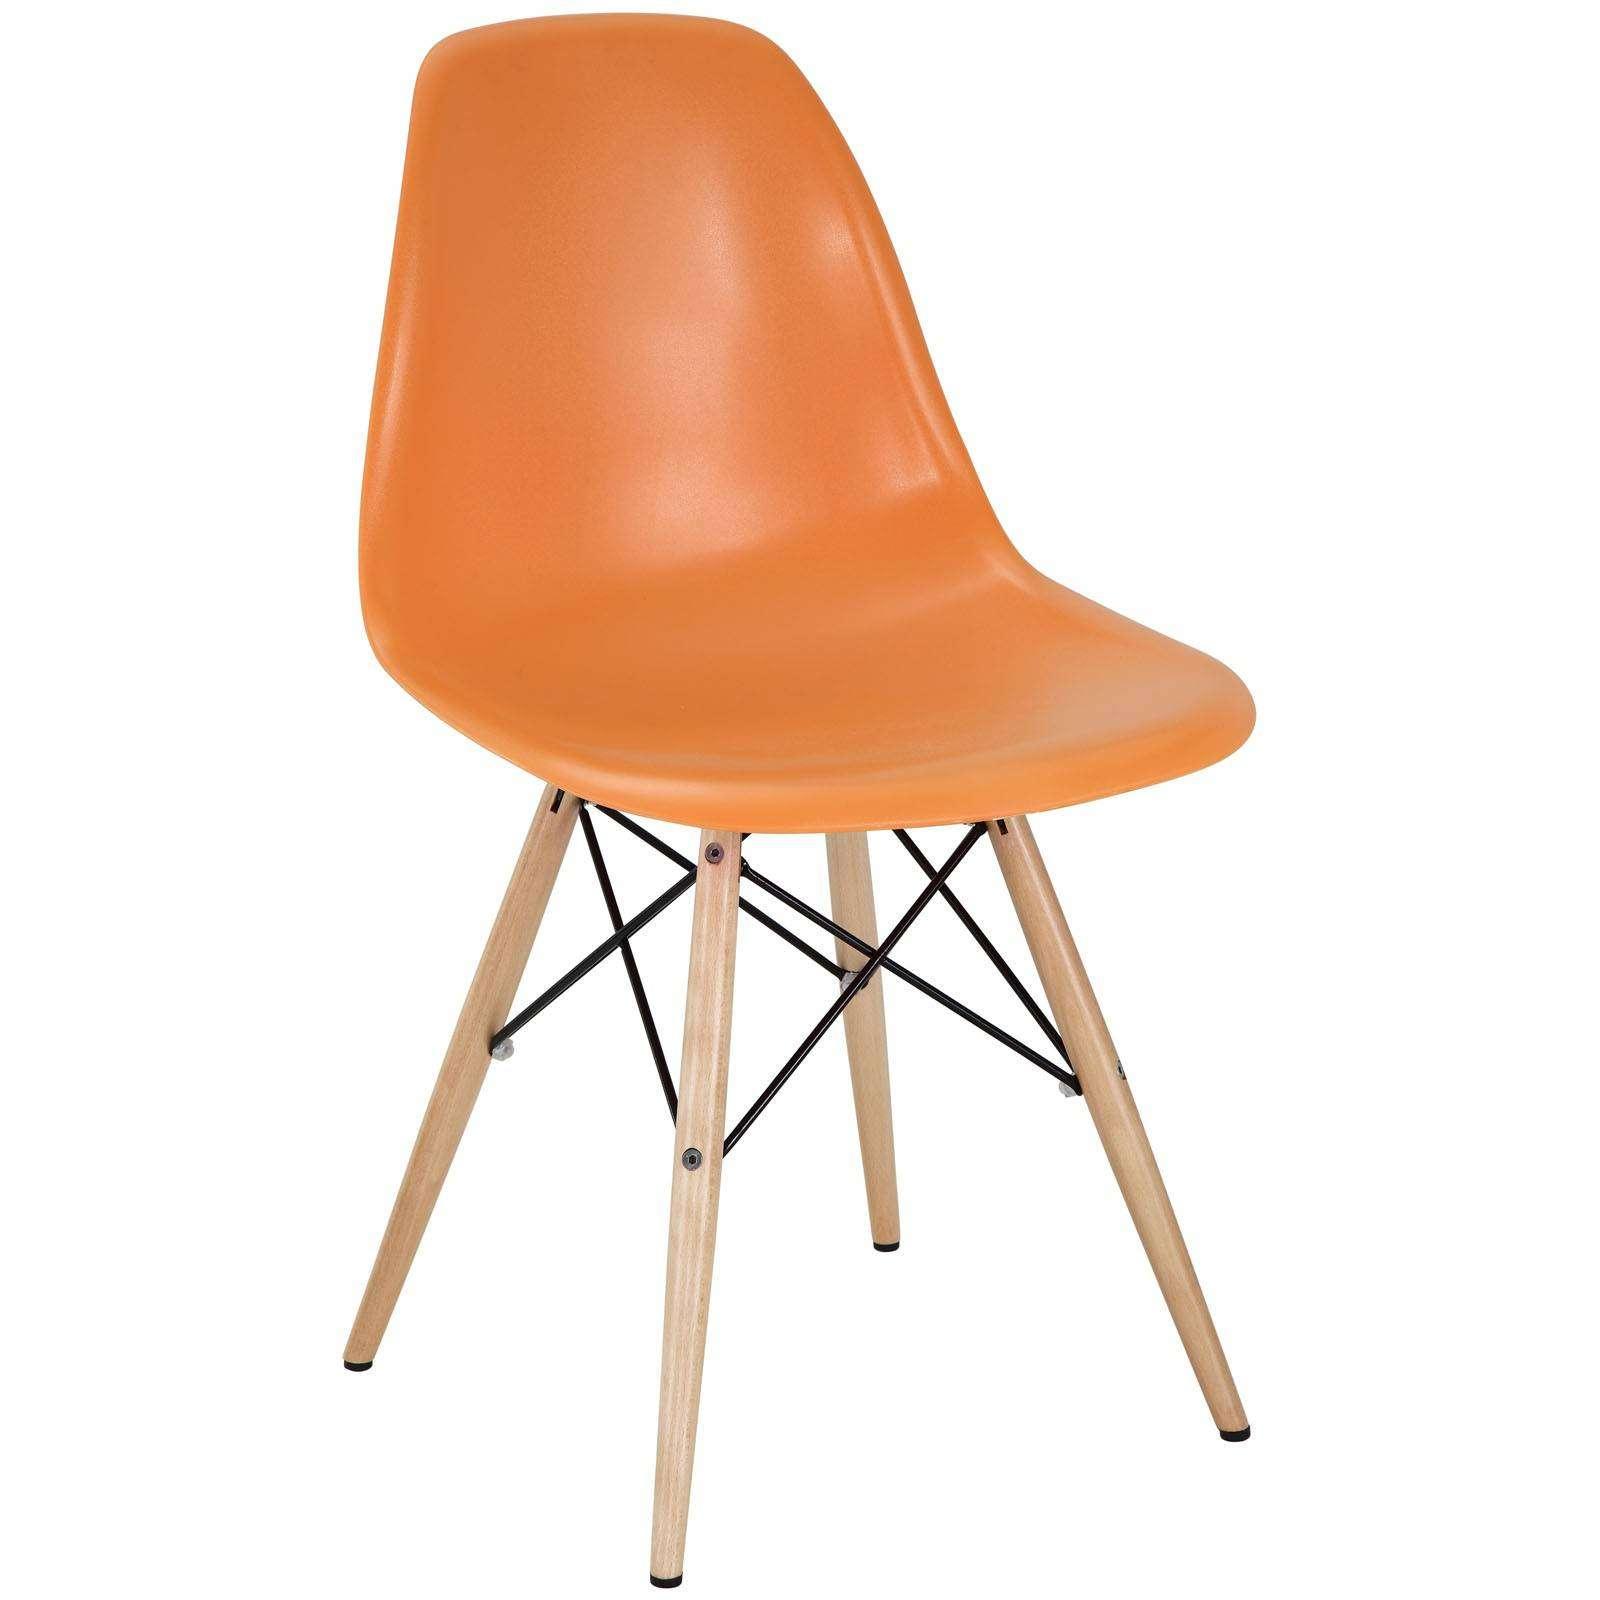 Wood Base Chairs ~ Pyramid dining side chair wood base dowel legs